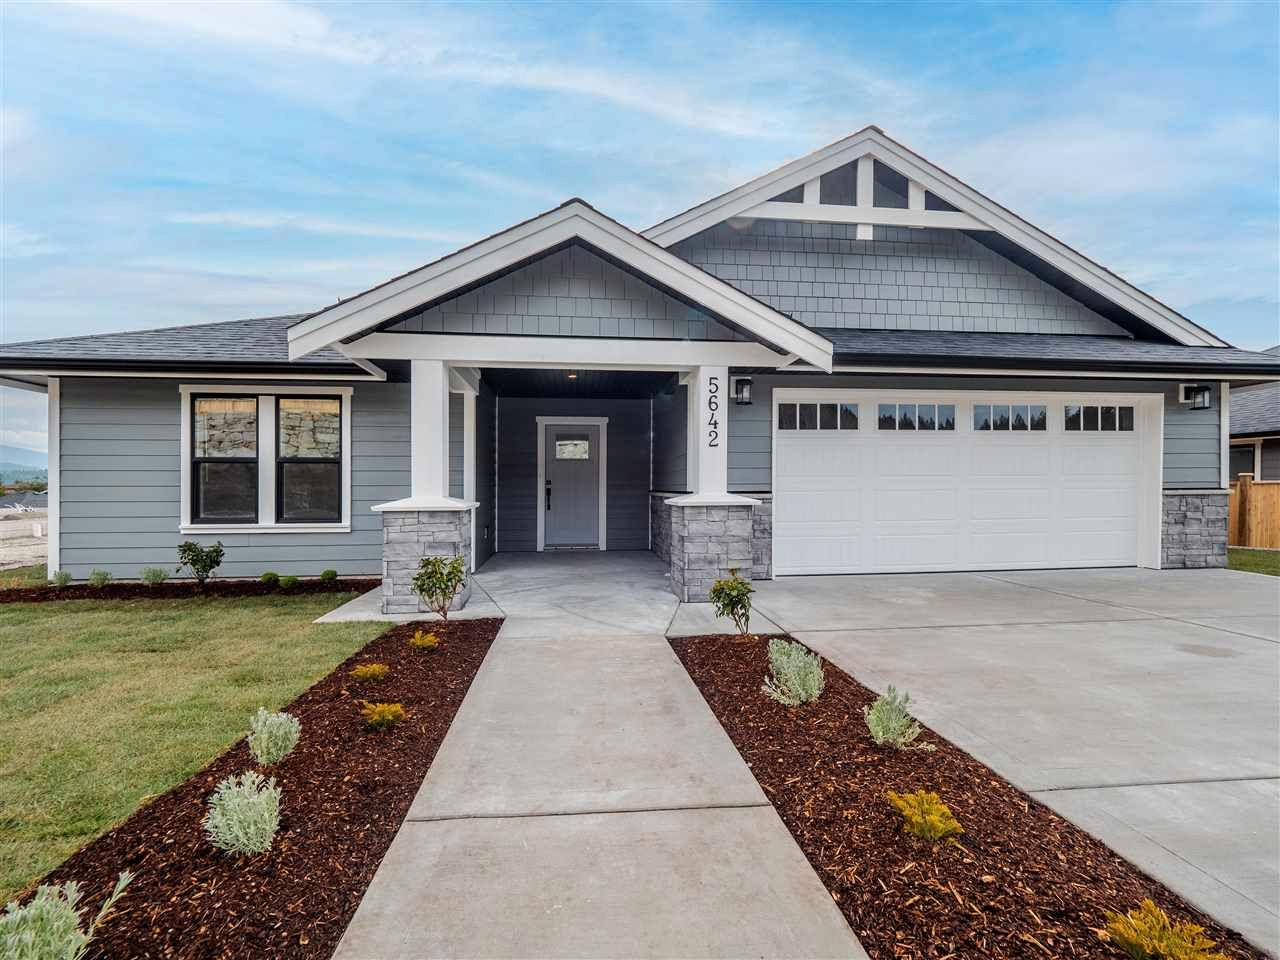 Main Photo: 6072 COWRIE Street in Sechelt: Sechelt District House for sale (Sunshine Coast)  : MLS®# R2623089